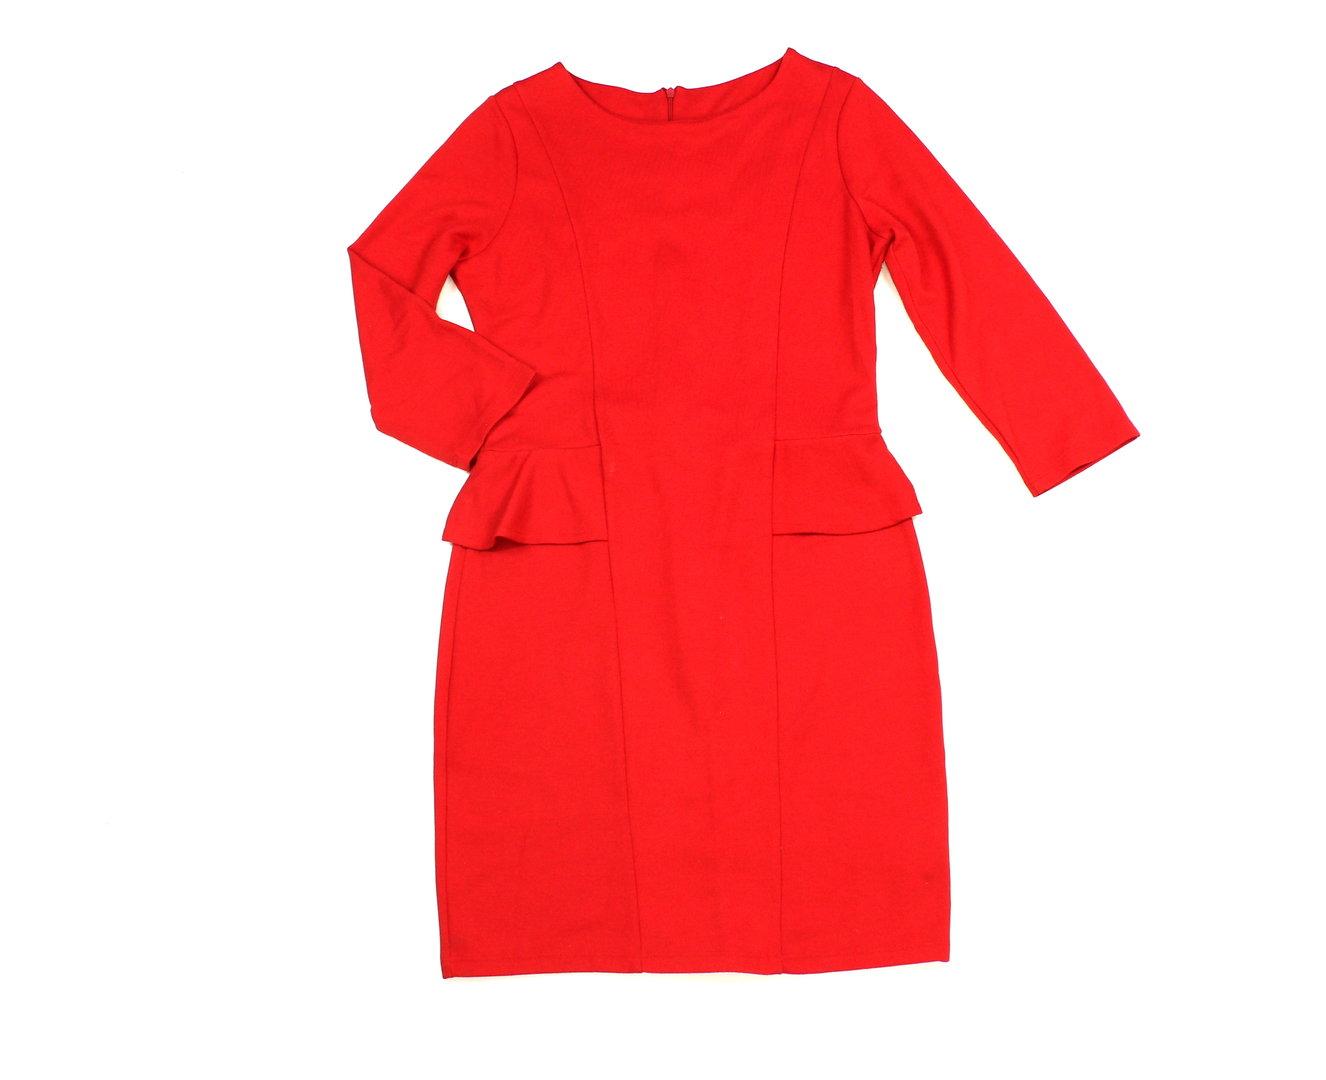 Rüschen Rot Business Damen Cocktail Mini Kleid 38 Nw0vm8no srdCthQ